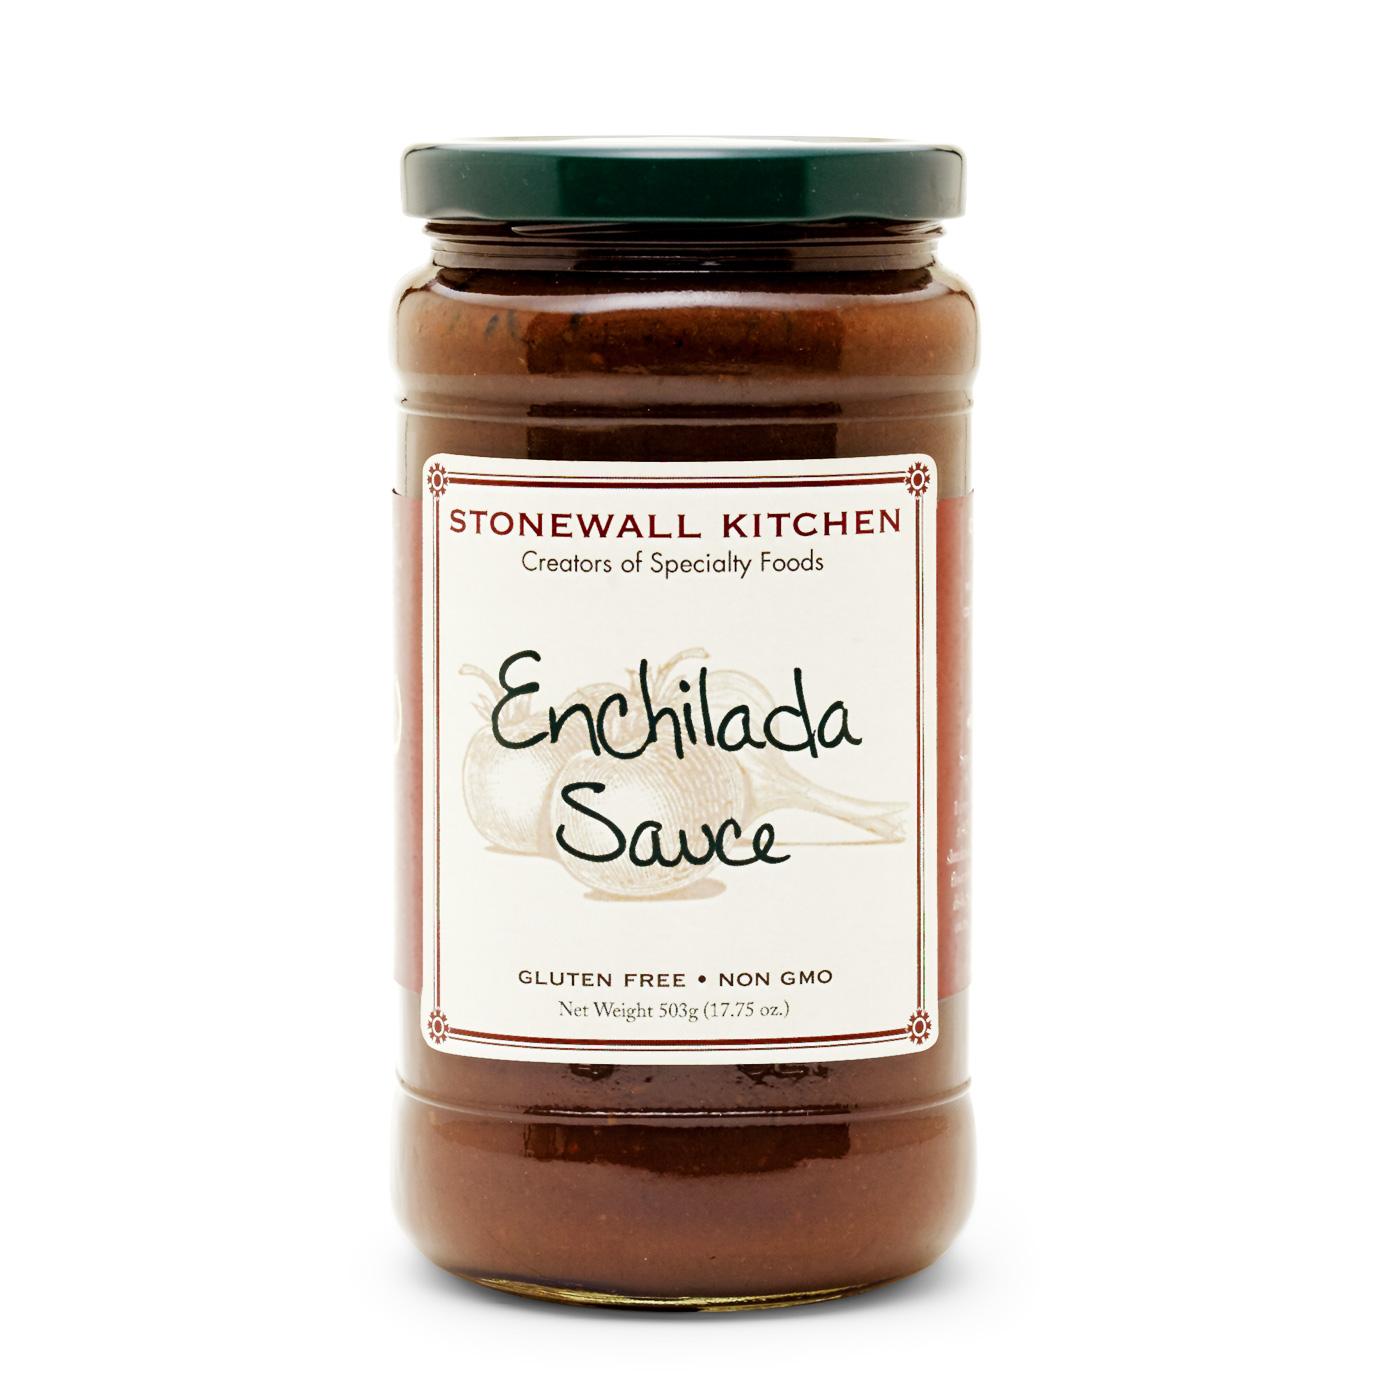 Enchilada Sauce | Sauces & Meal Starters | Stonewall Kitchen